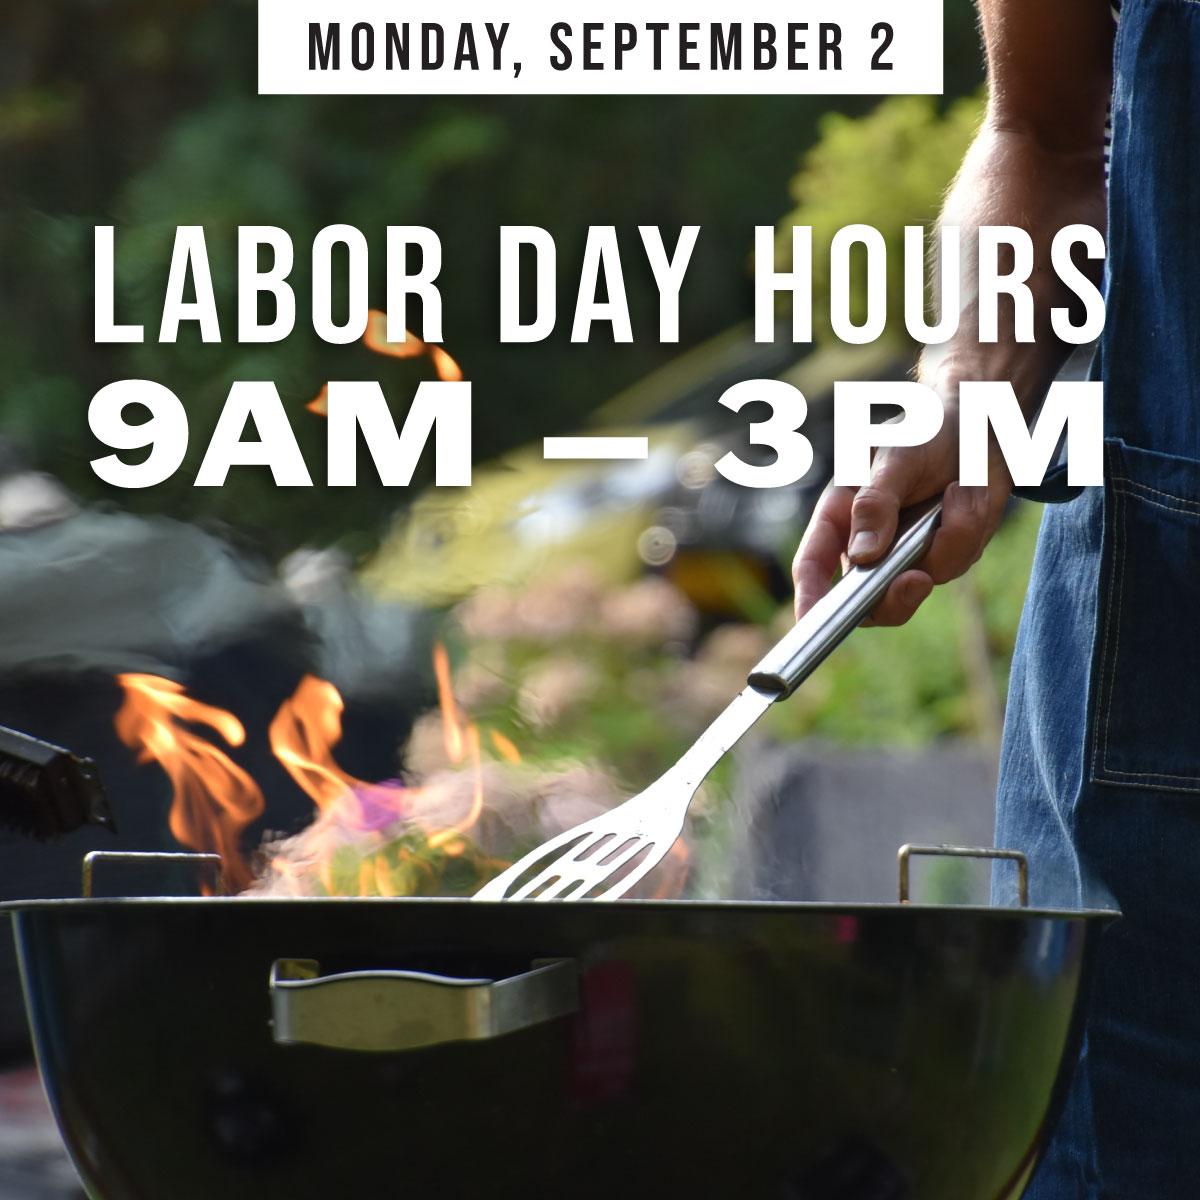 CCM-labor-day-hours.jpg